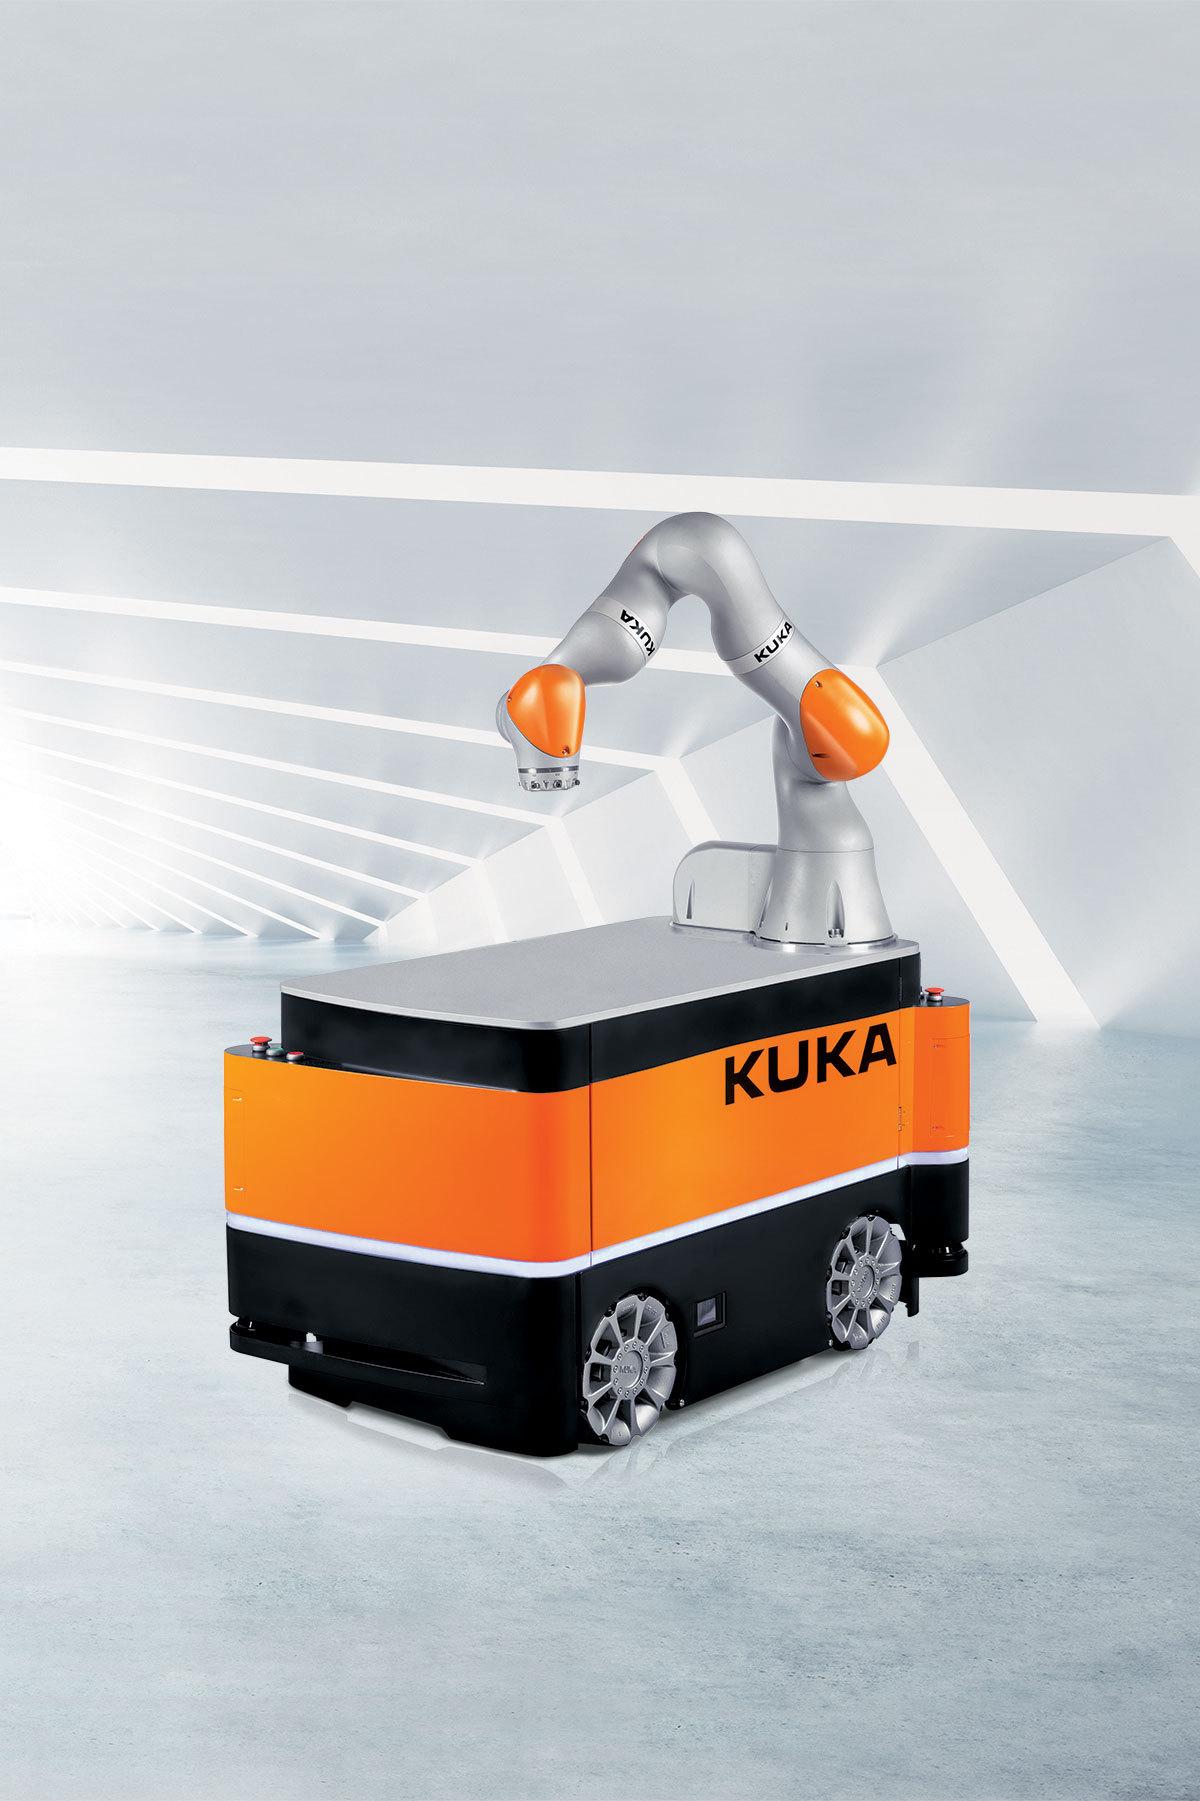 Kuka Robotics Corporation Showcases Mobile Robotics At Automate 2017